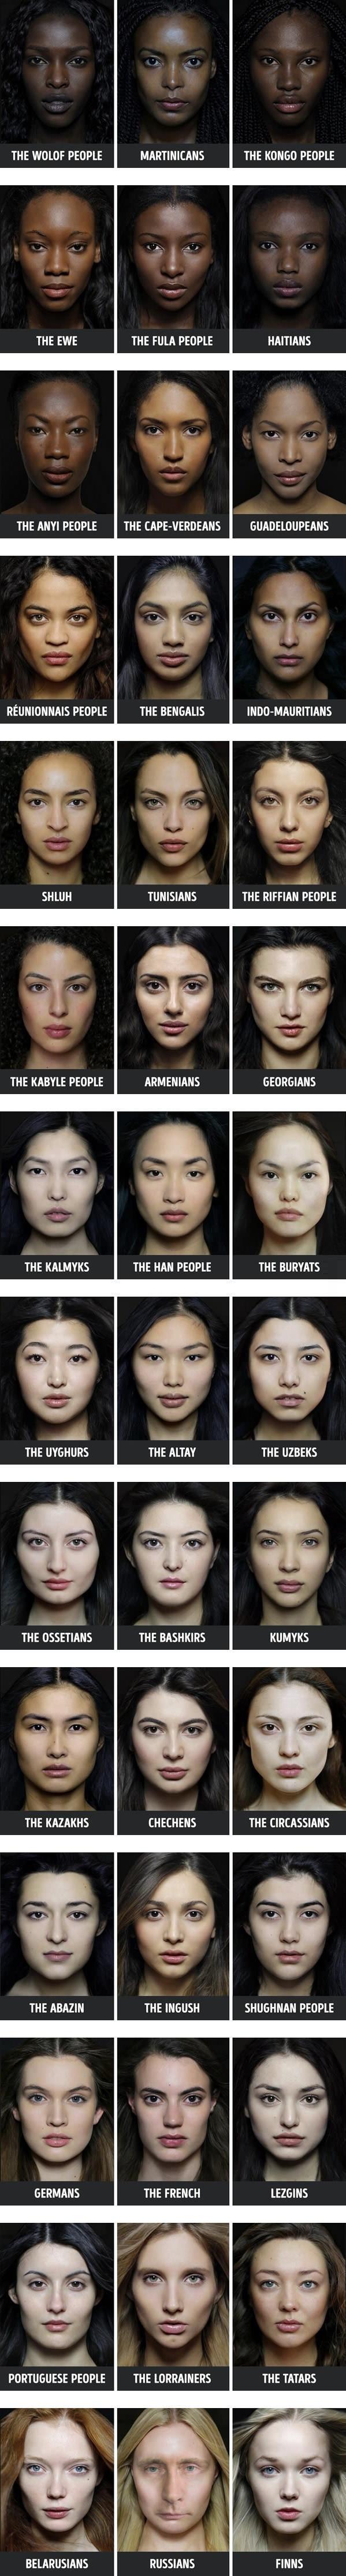 Beauty of the human race